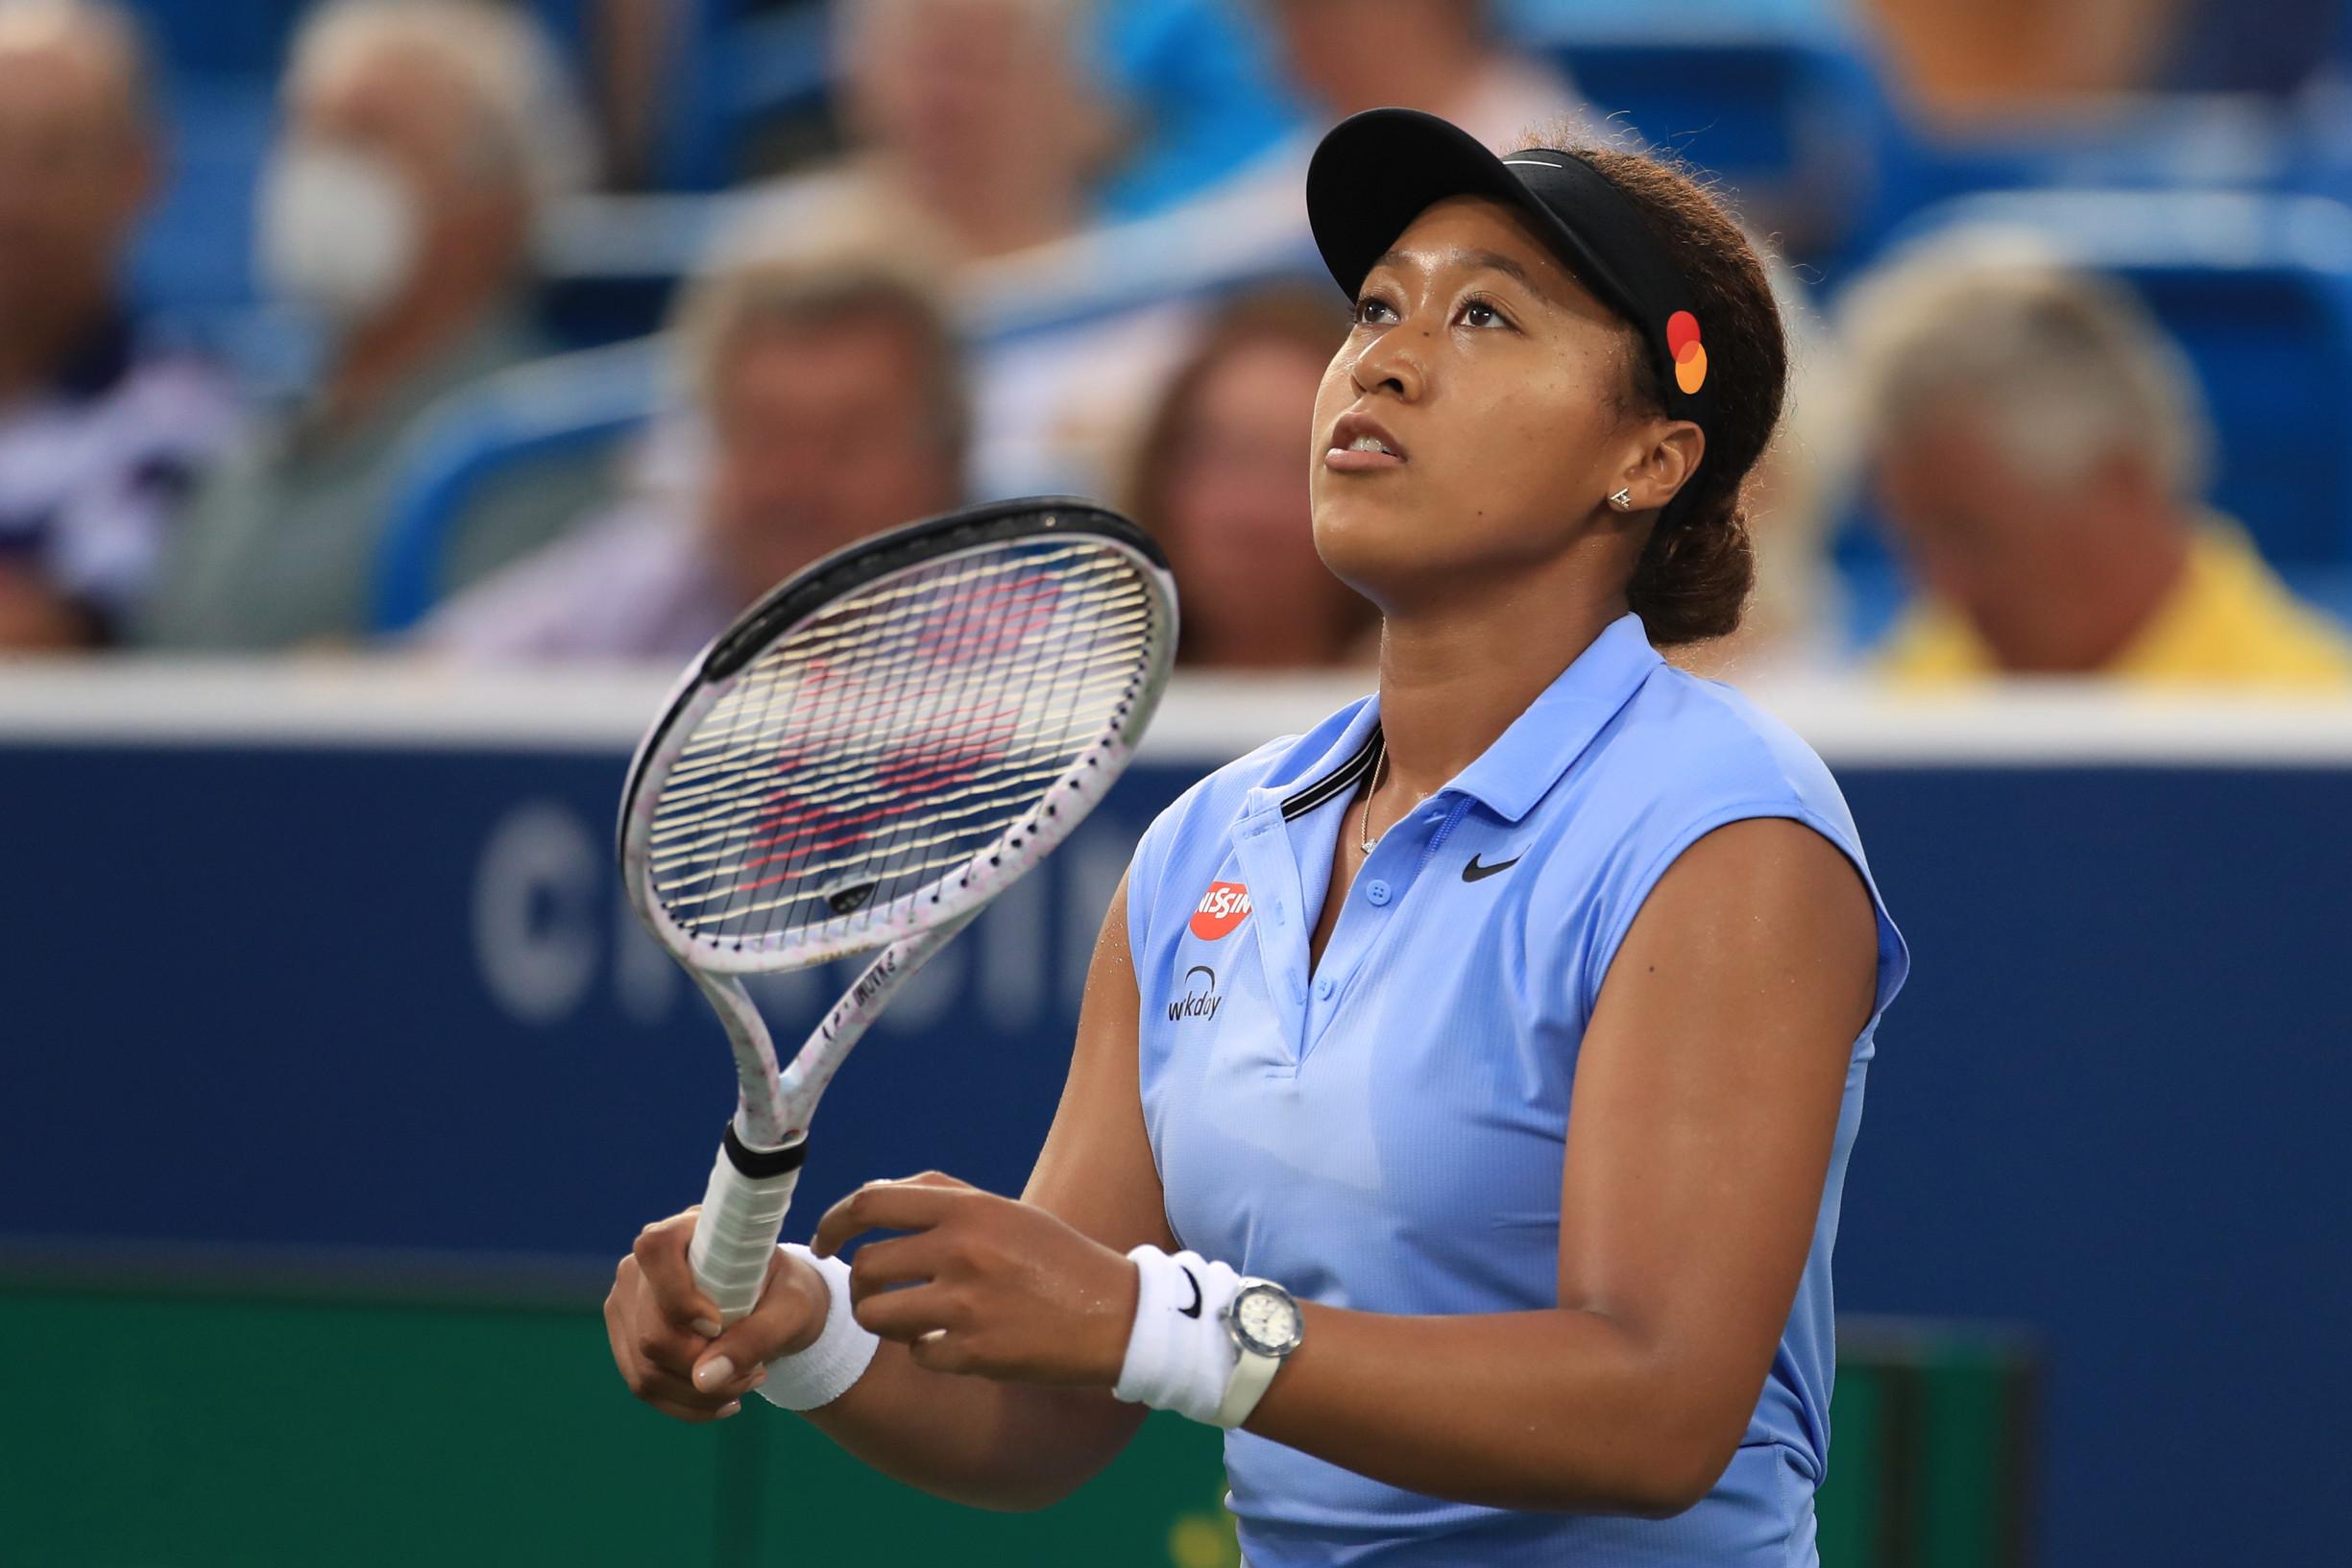 US Open star Naomi Osaka receives mental health praise from Billie Jean King